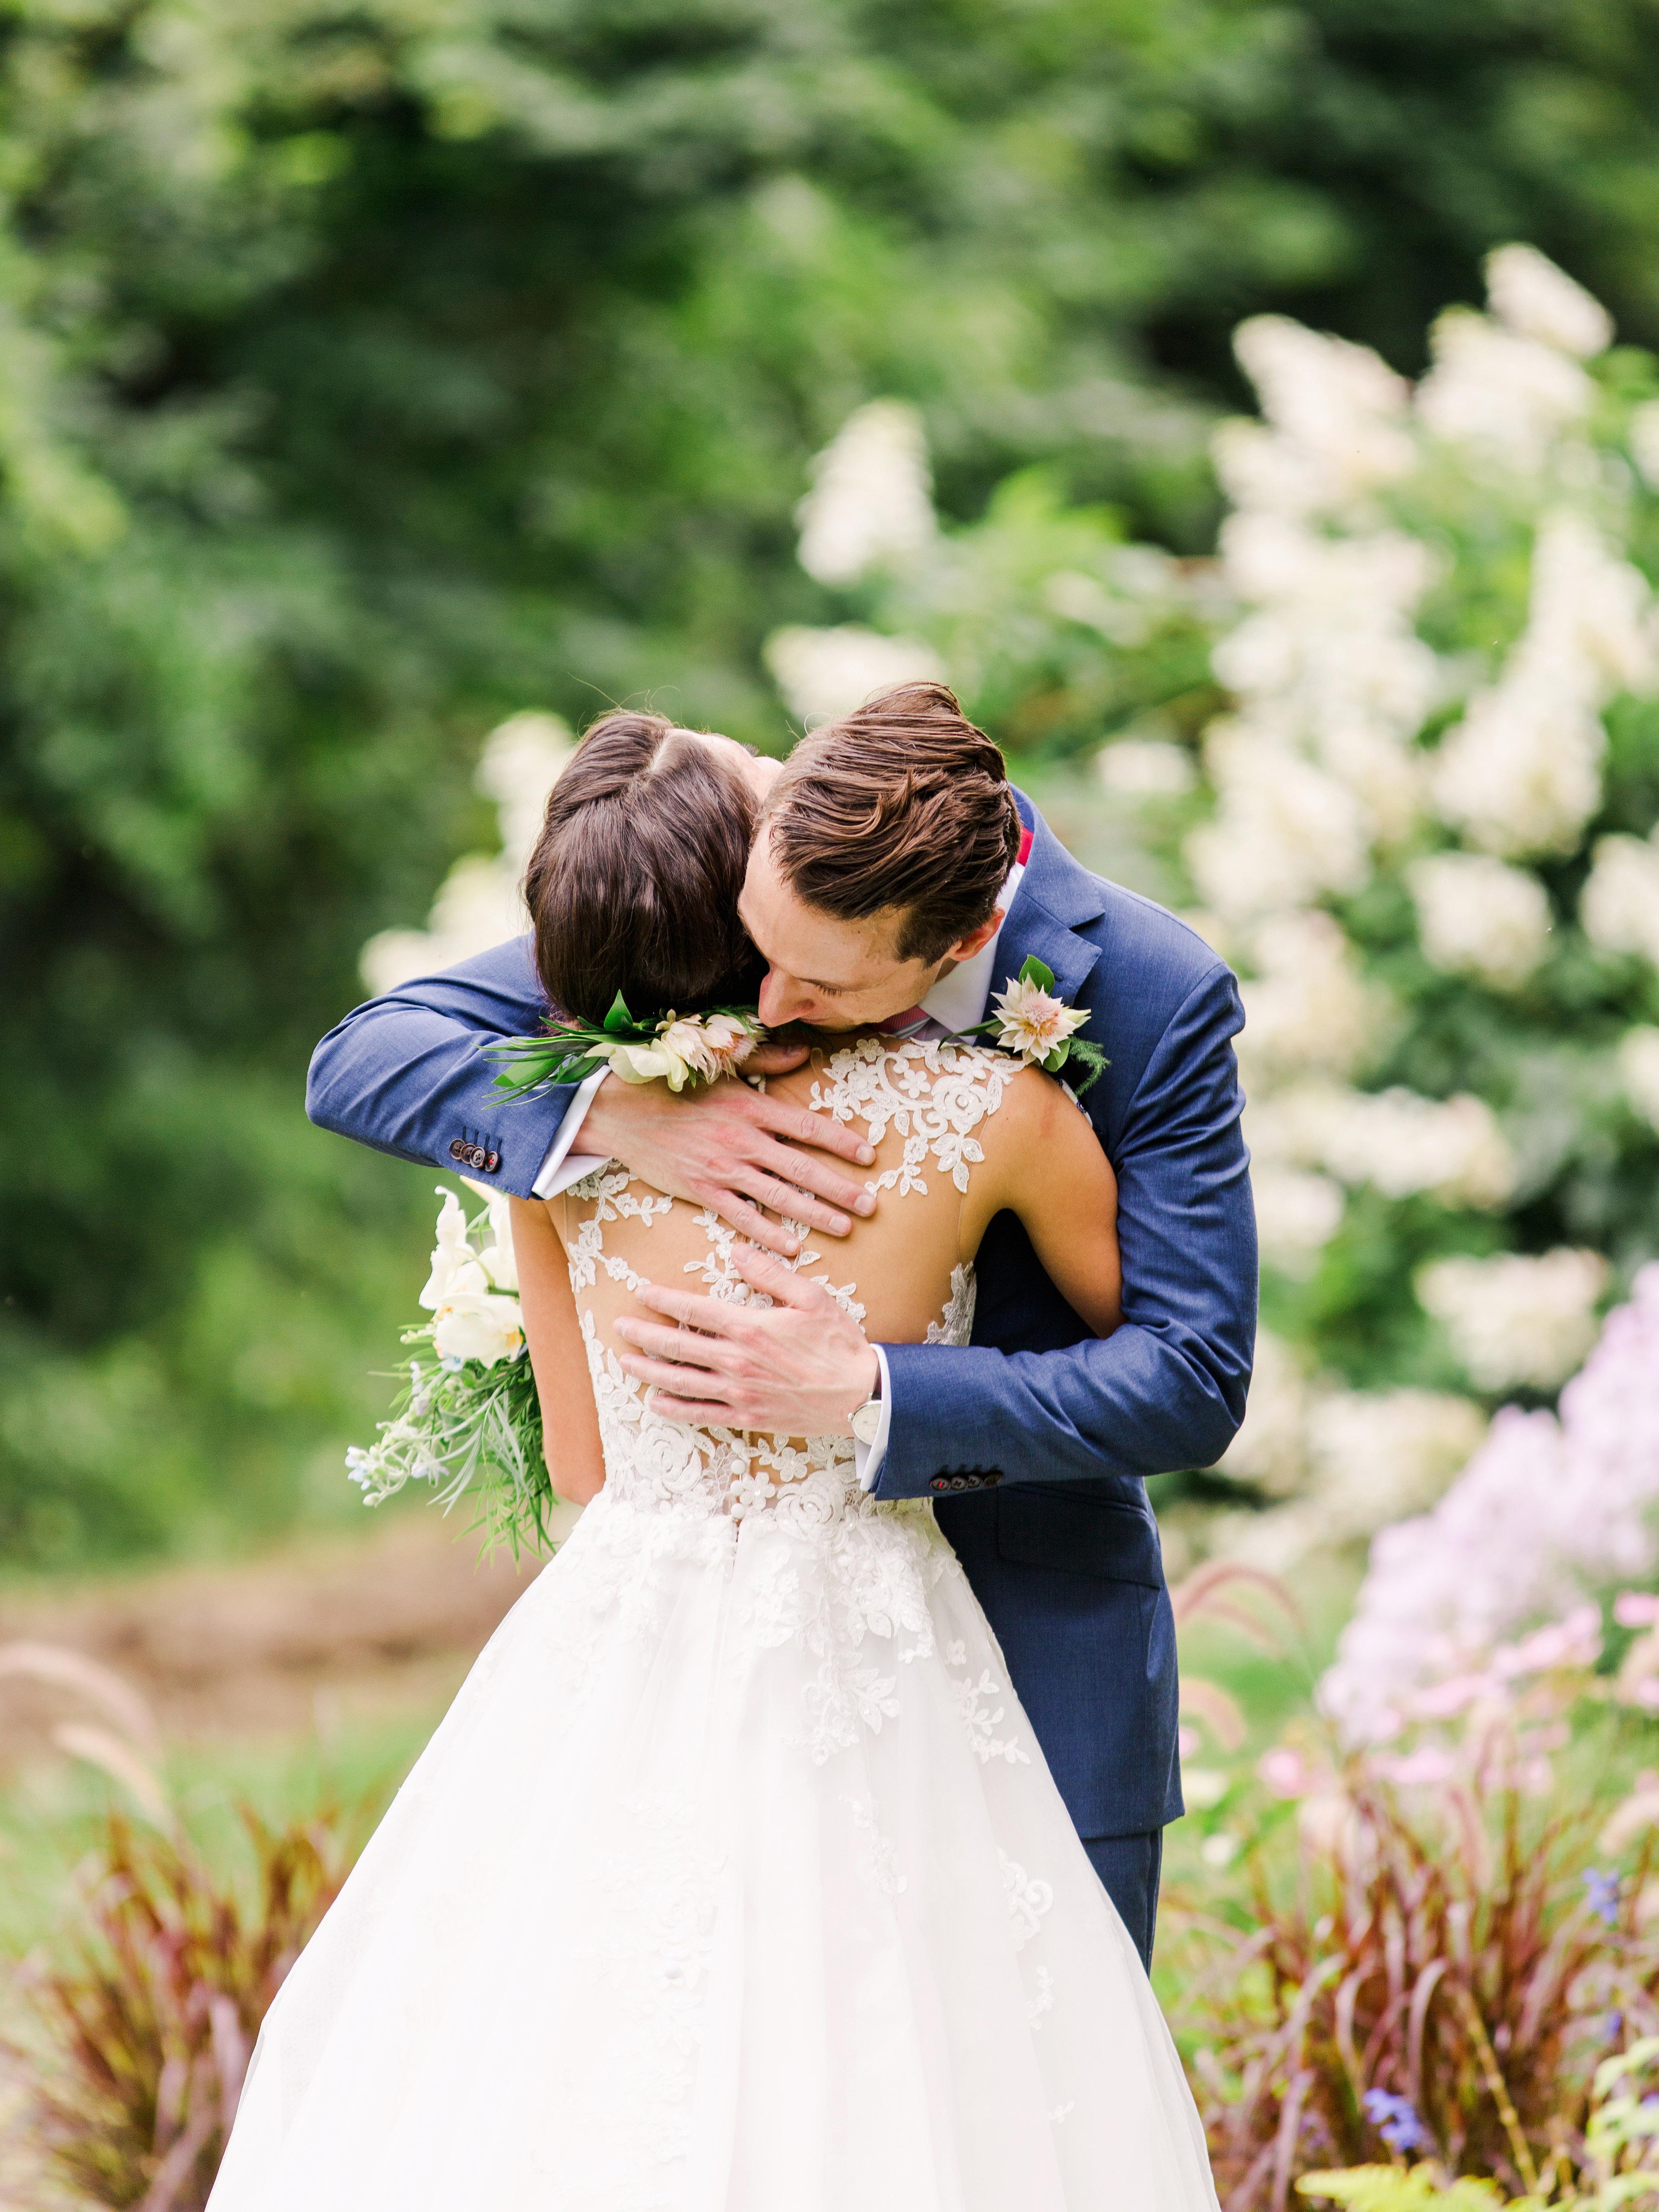 dayane collin wedding first look couple hug